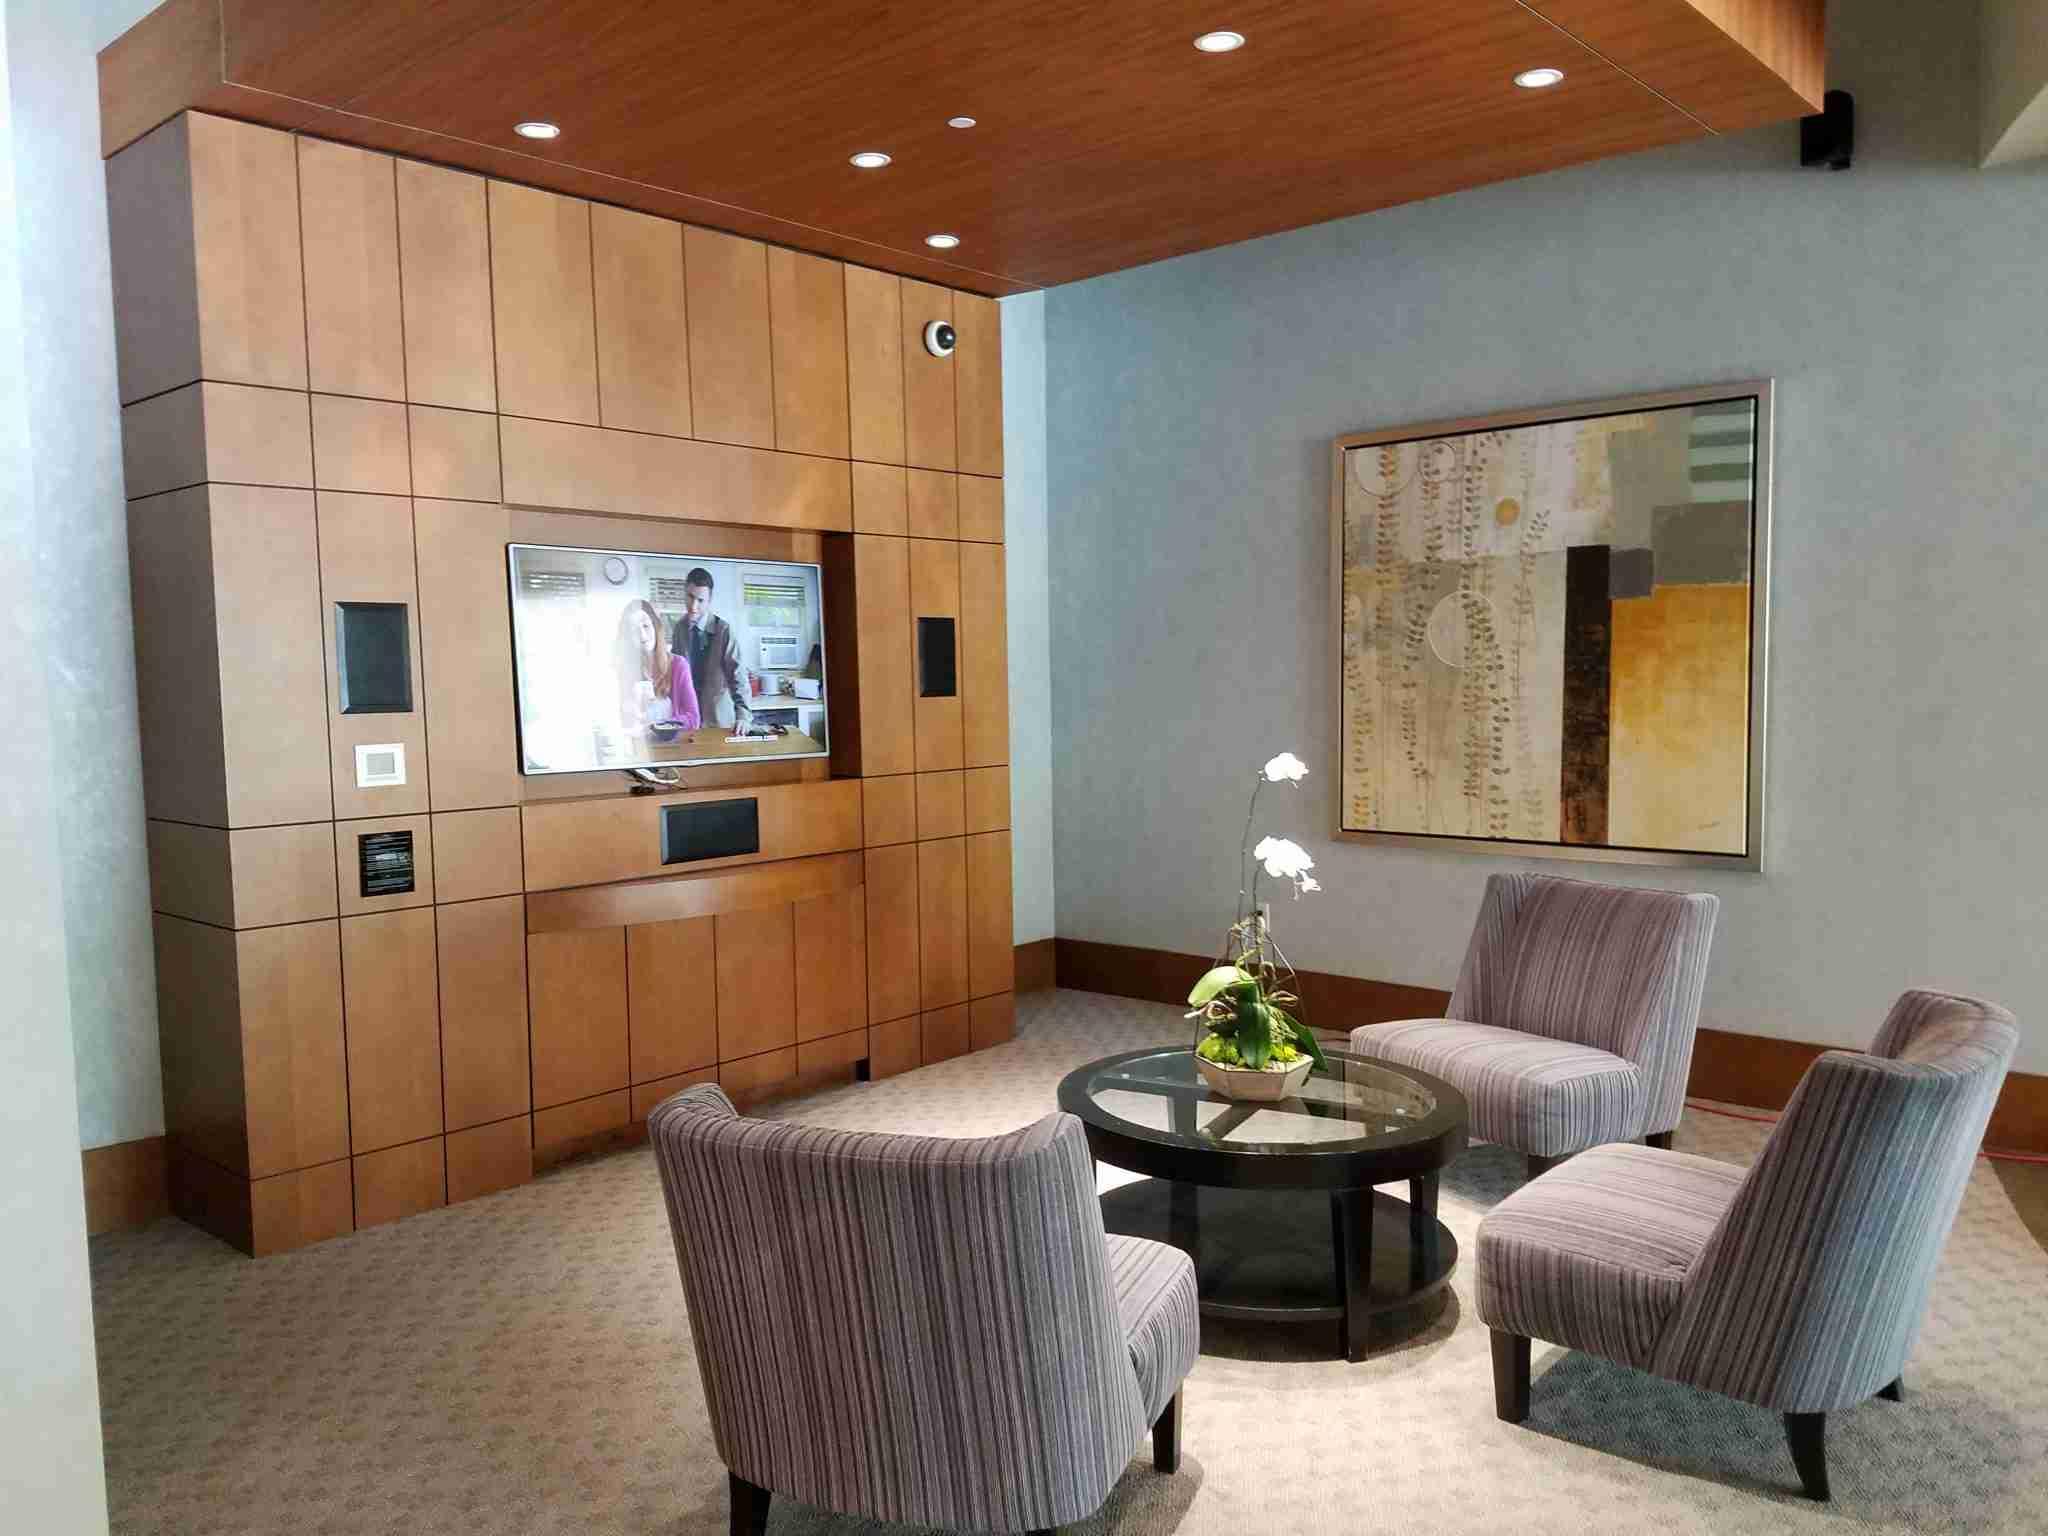 Sitting area inside the lobby of The Realm in Buckhead Atlanta